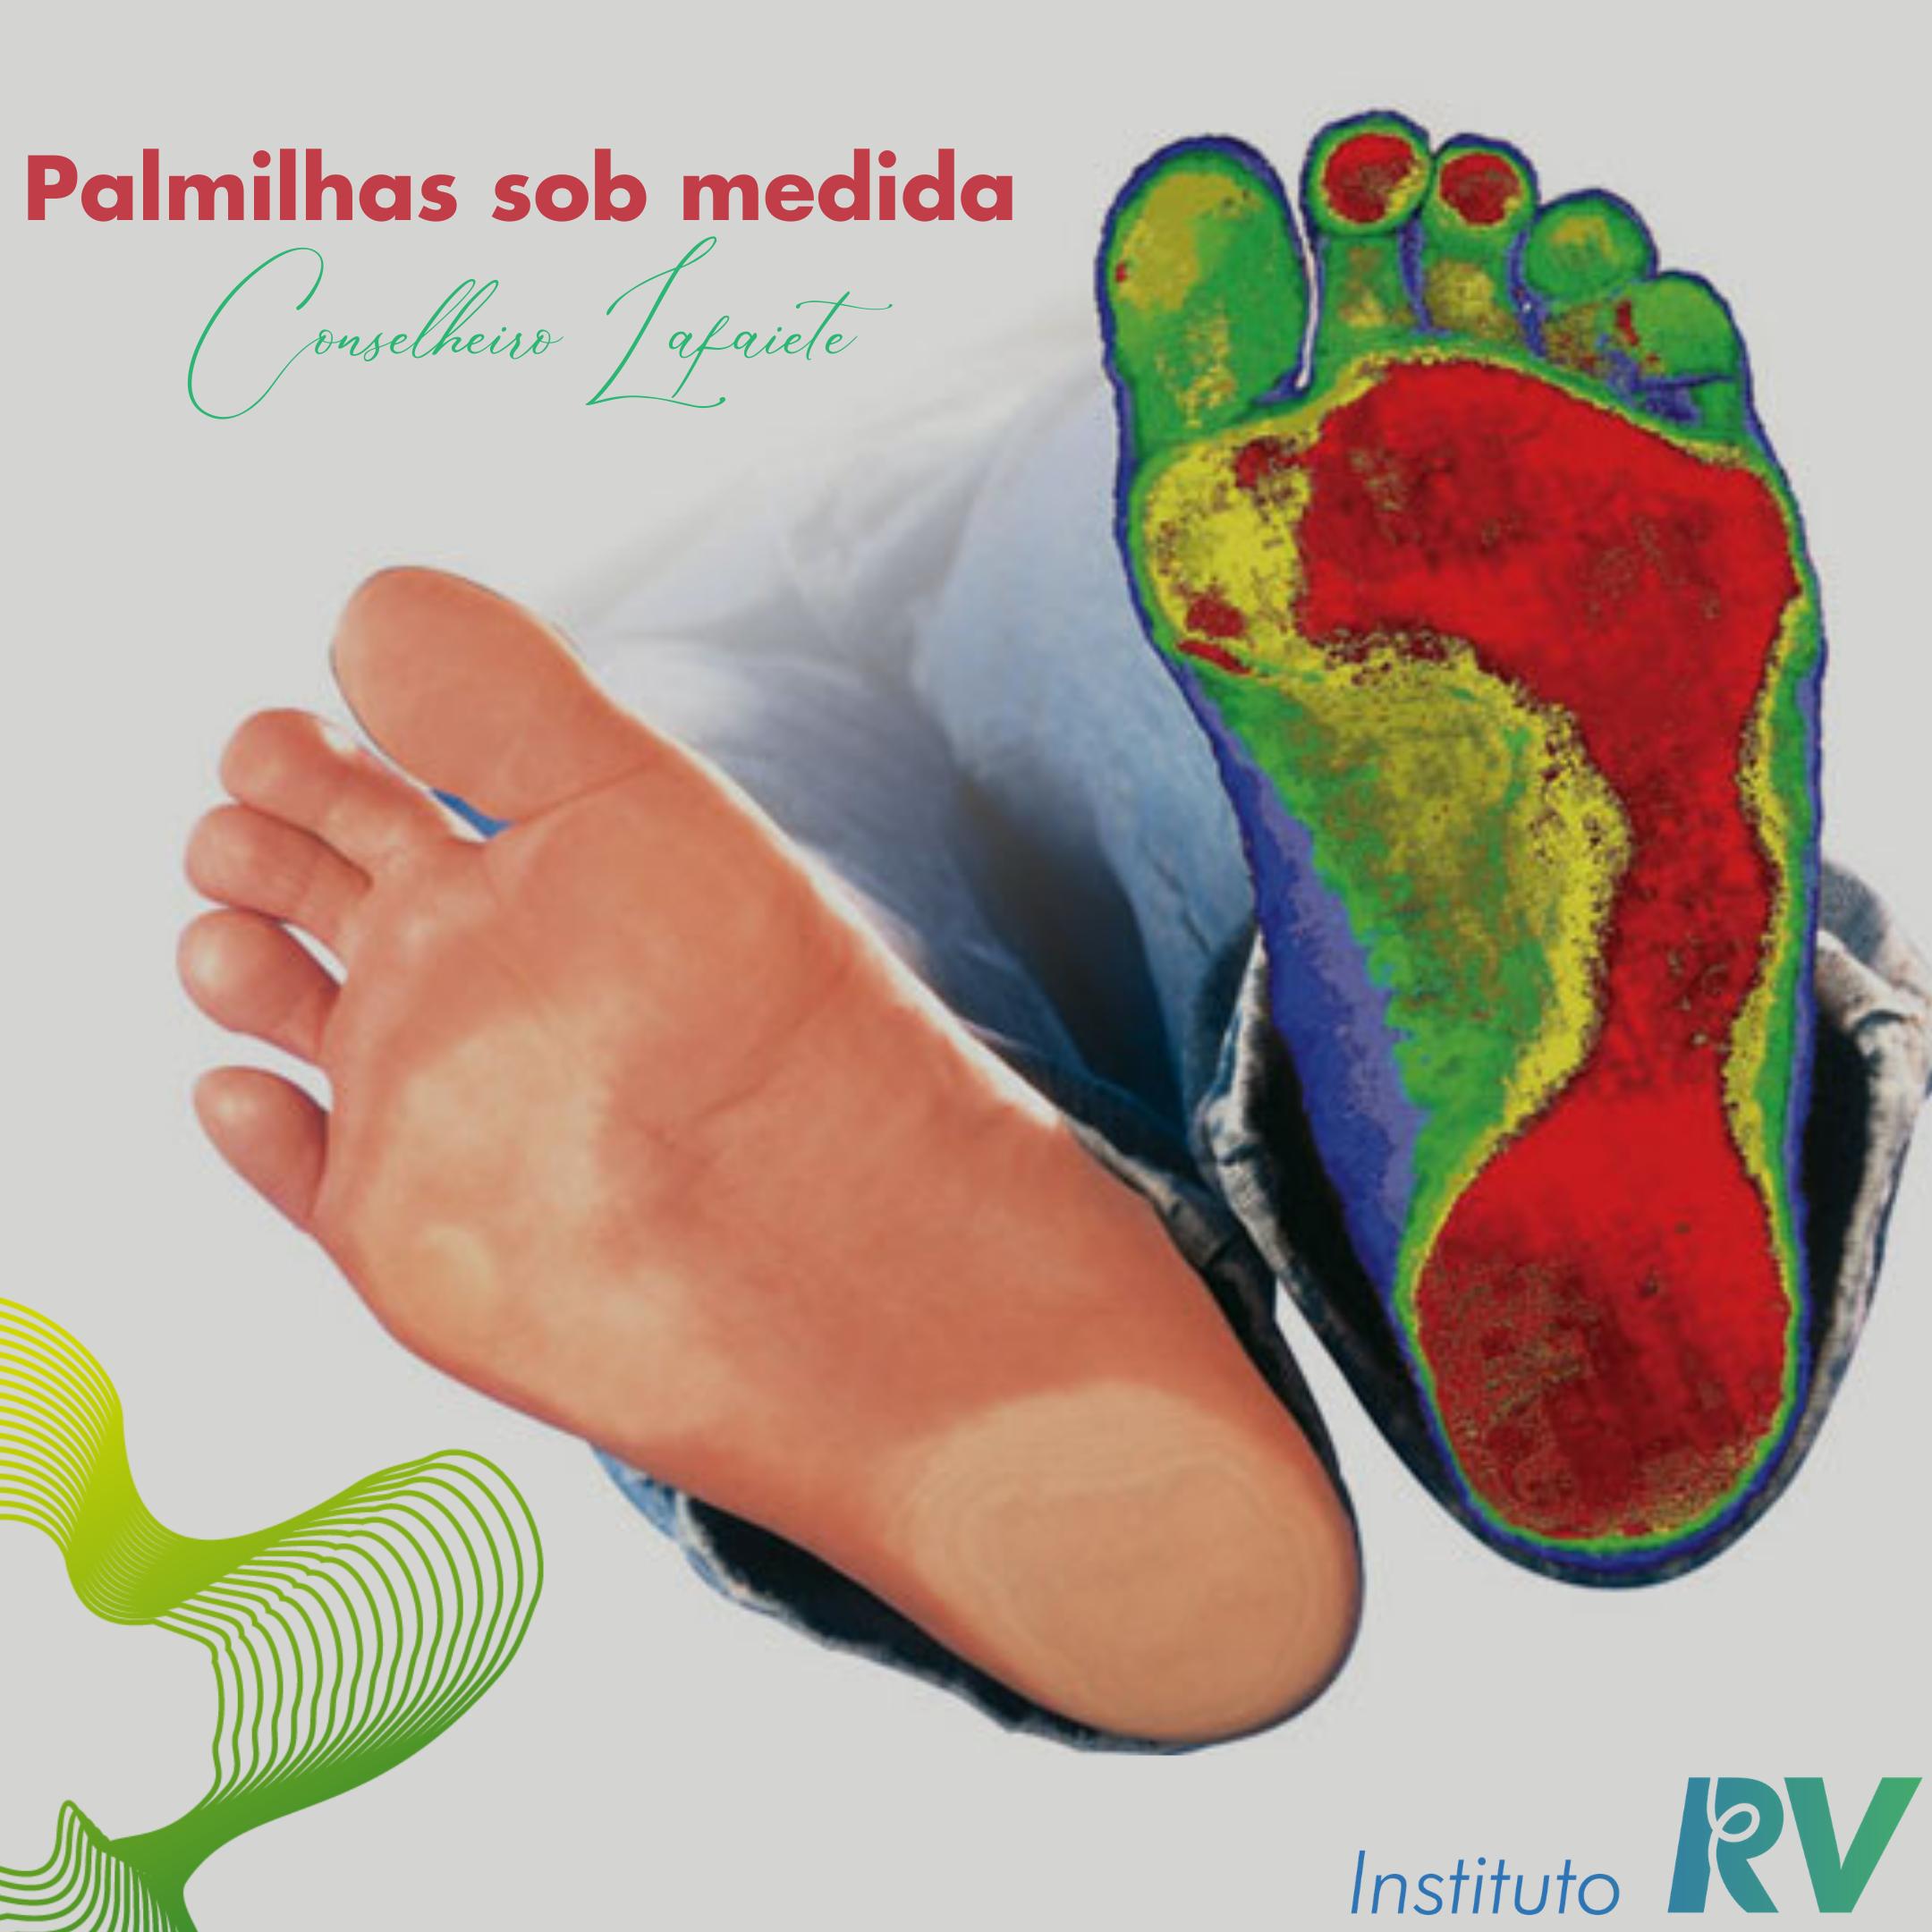 Palmilhas sob medida ortopédica